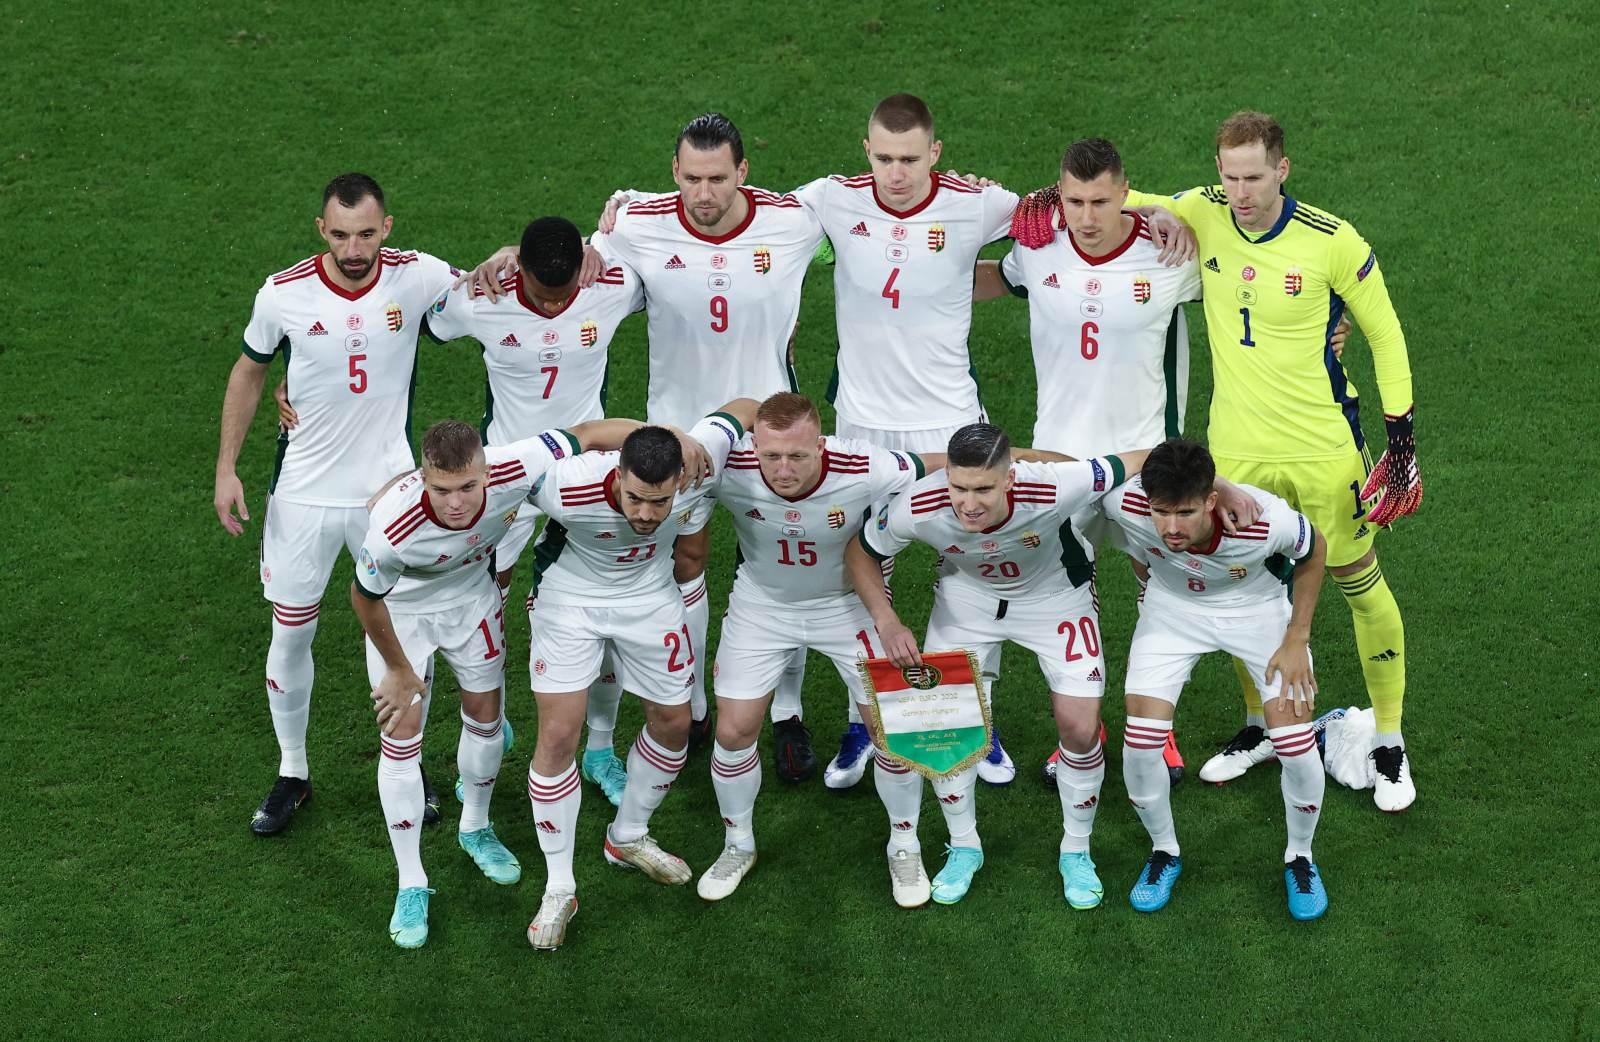 Албания – Венгрия: прогноз на матч отборочного цикла чемпионата мира-2022 - 5 сентября 2021